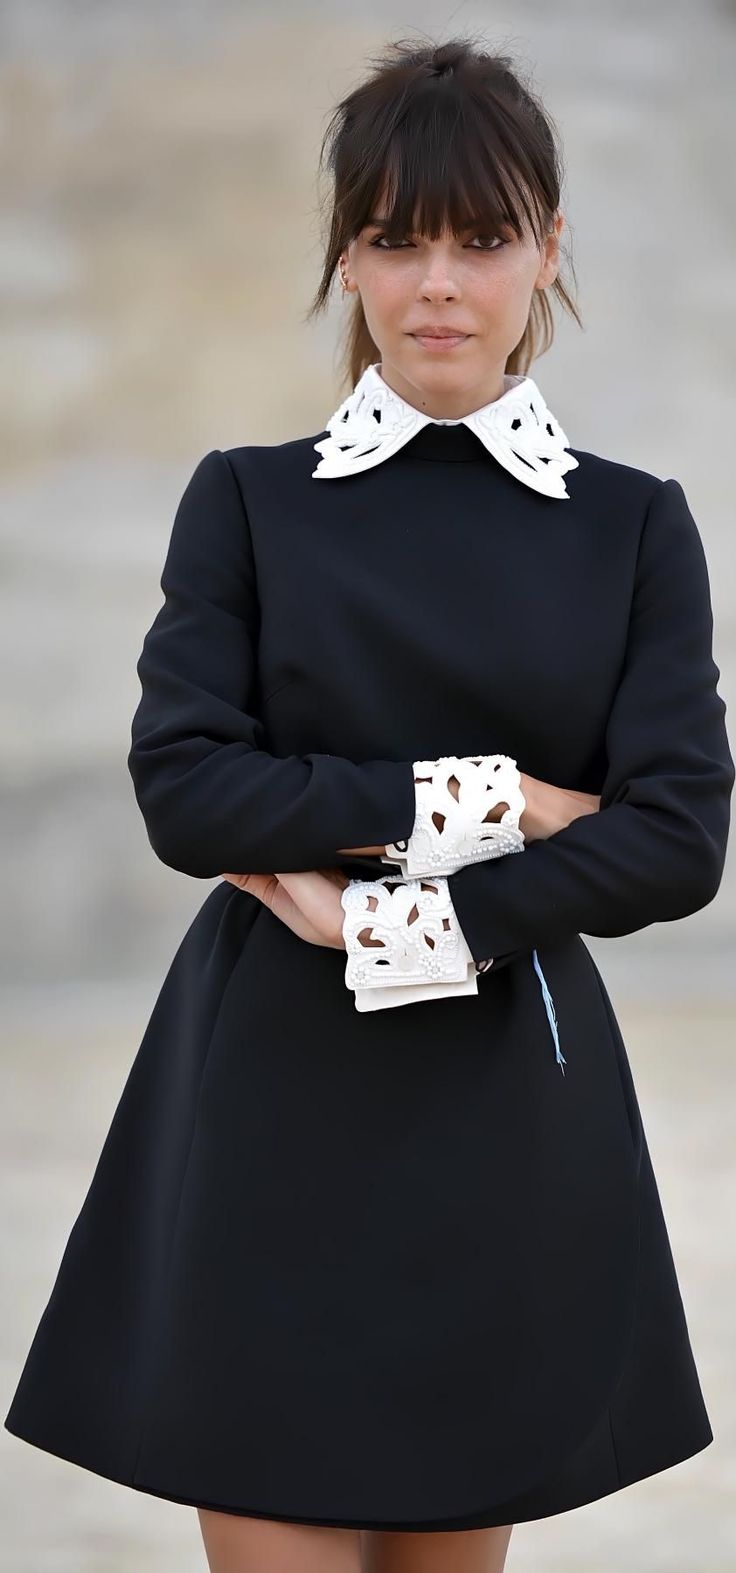 Collar and cuffs.